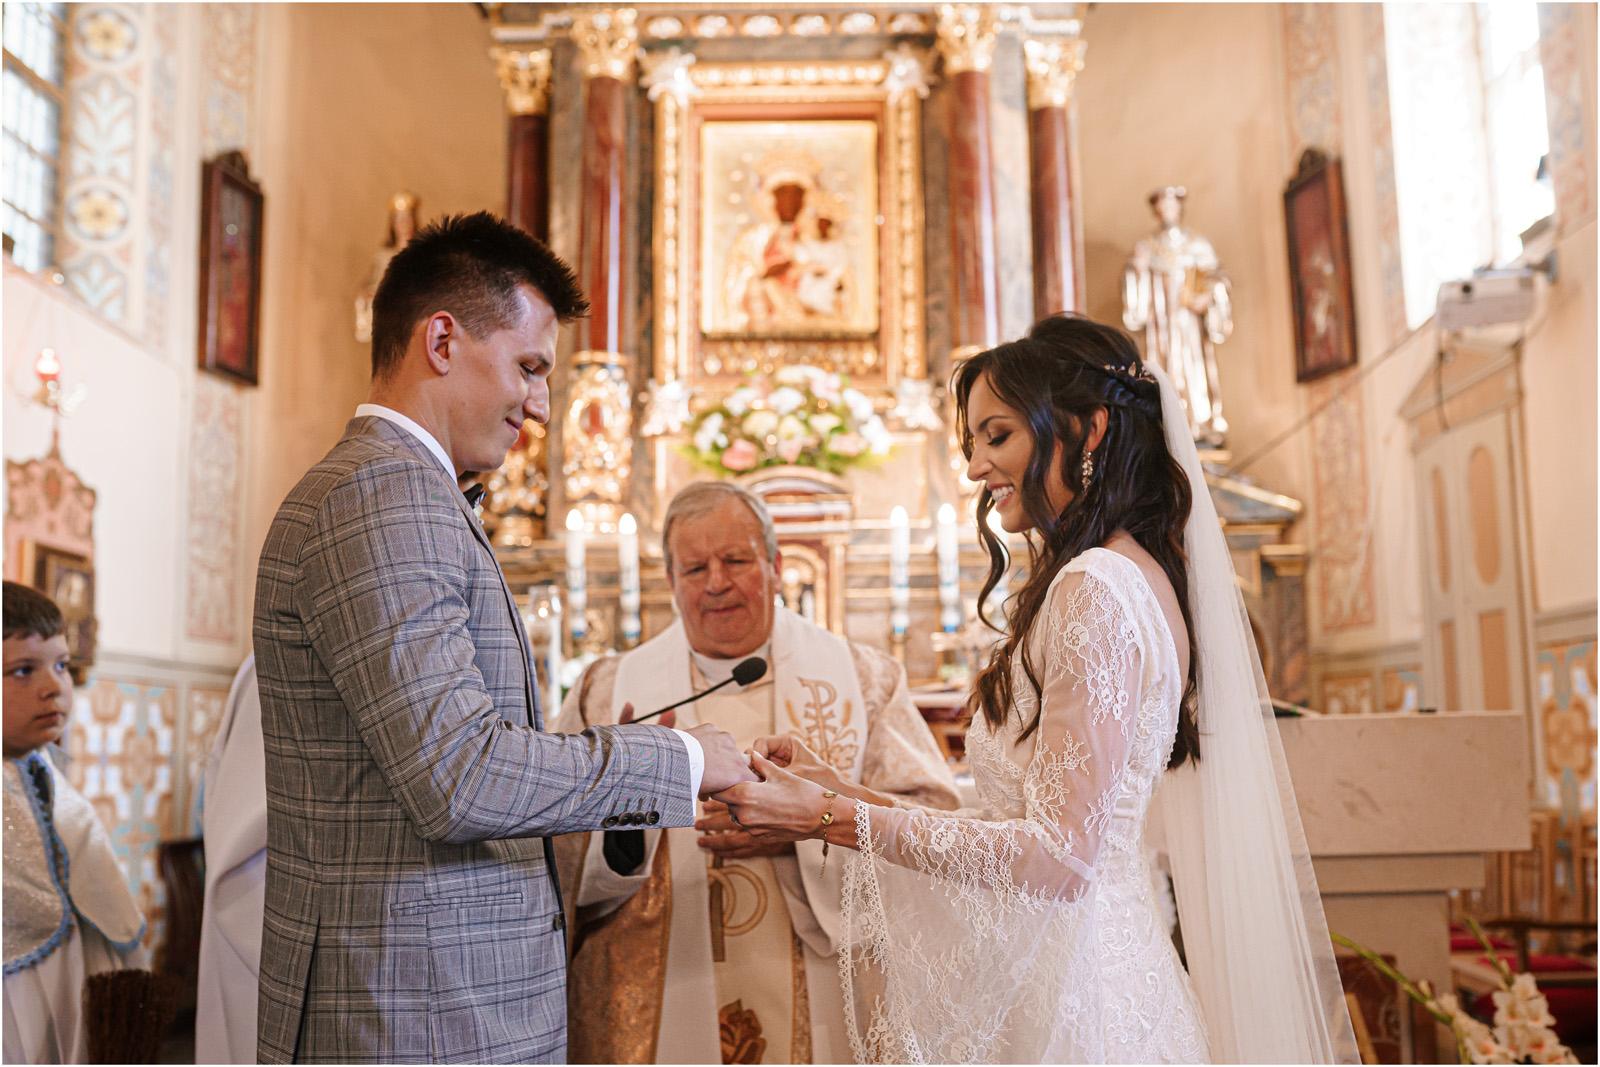 Ania & Mateusz | boho wesele w Stodole pod Kasztanami 45